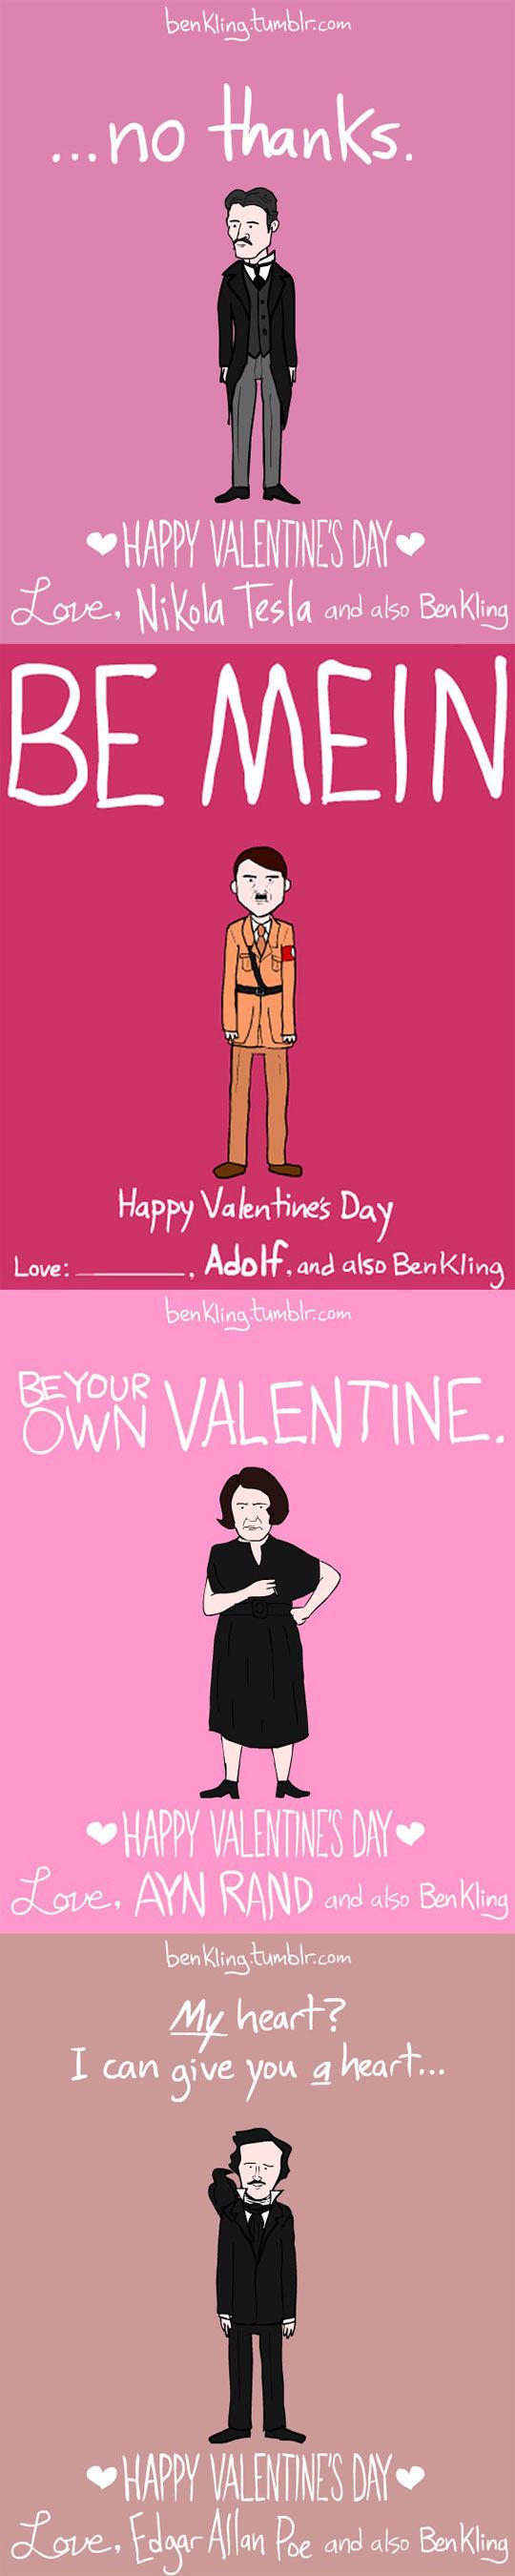 14 clever Valentine